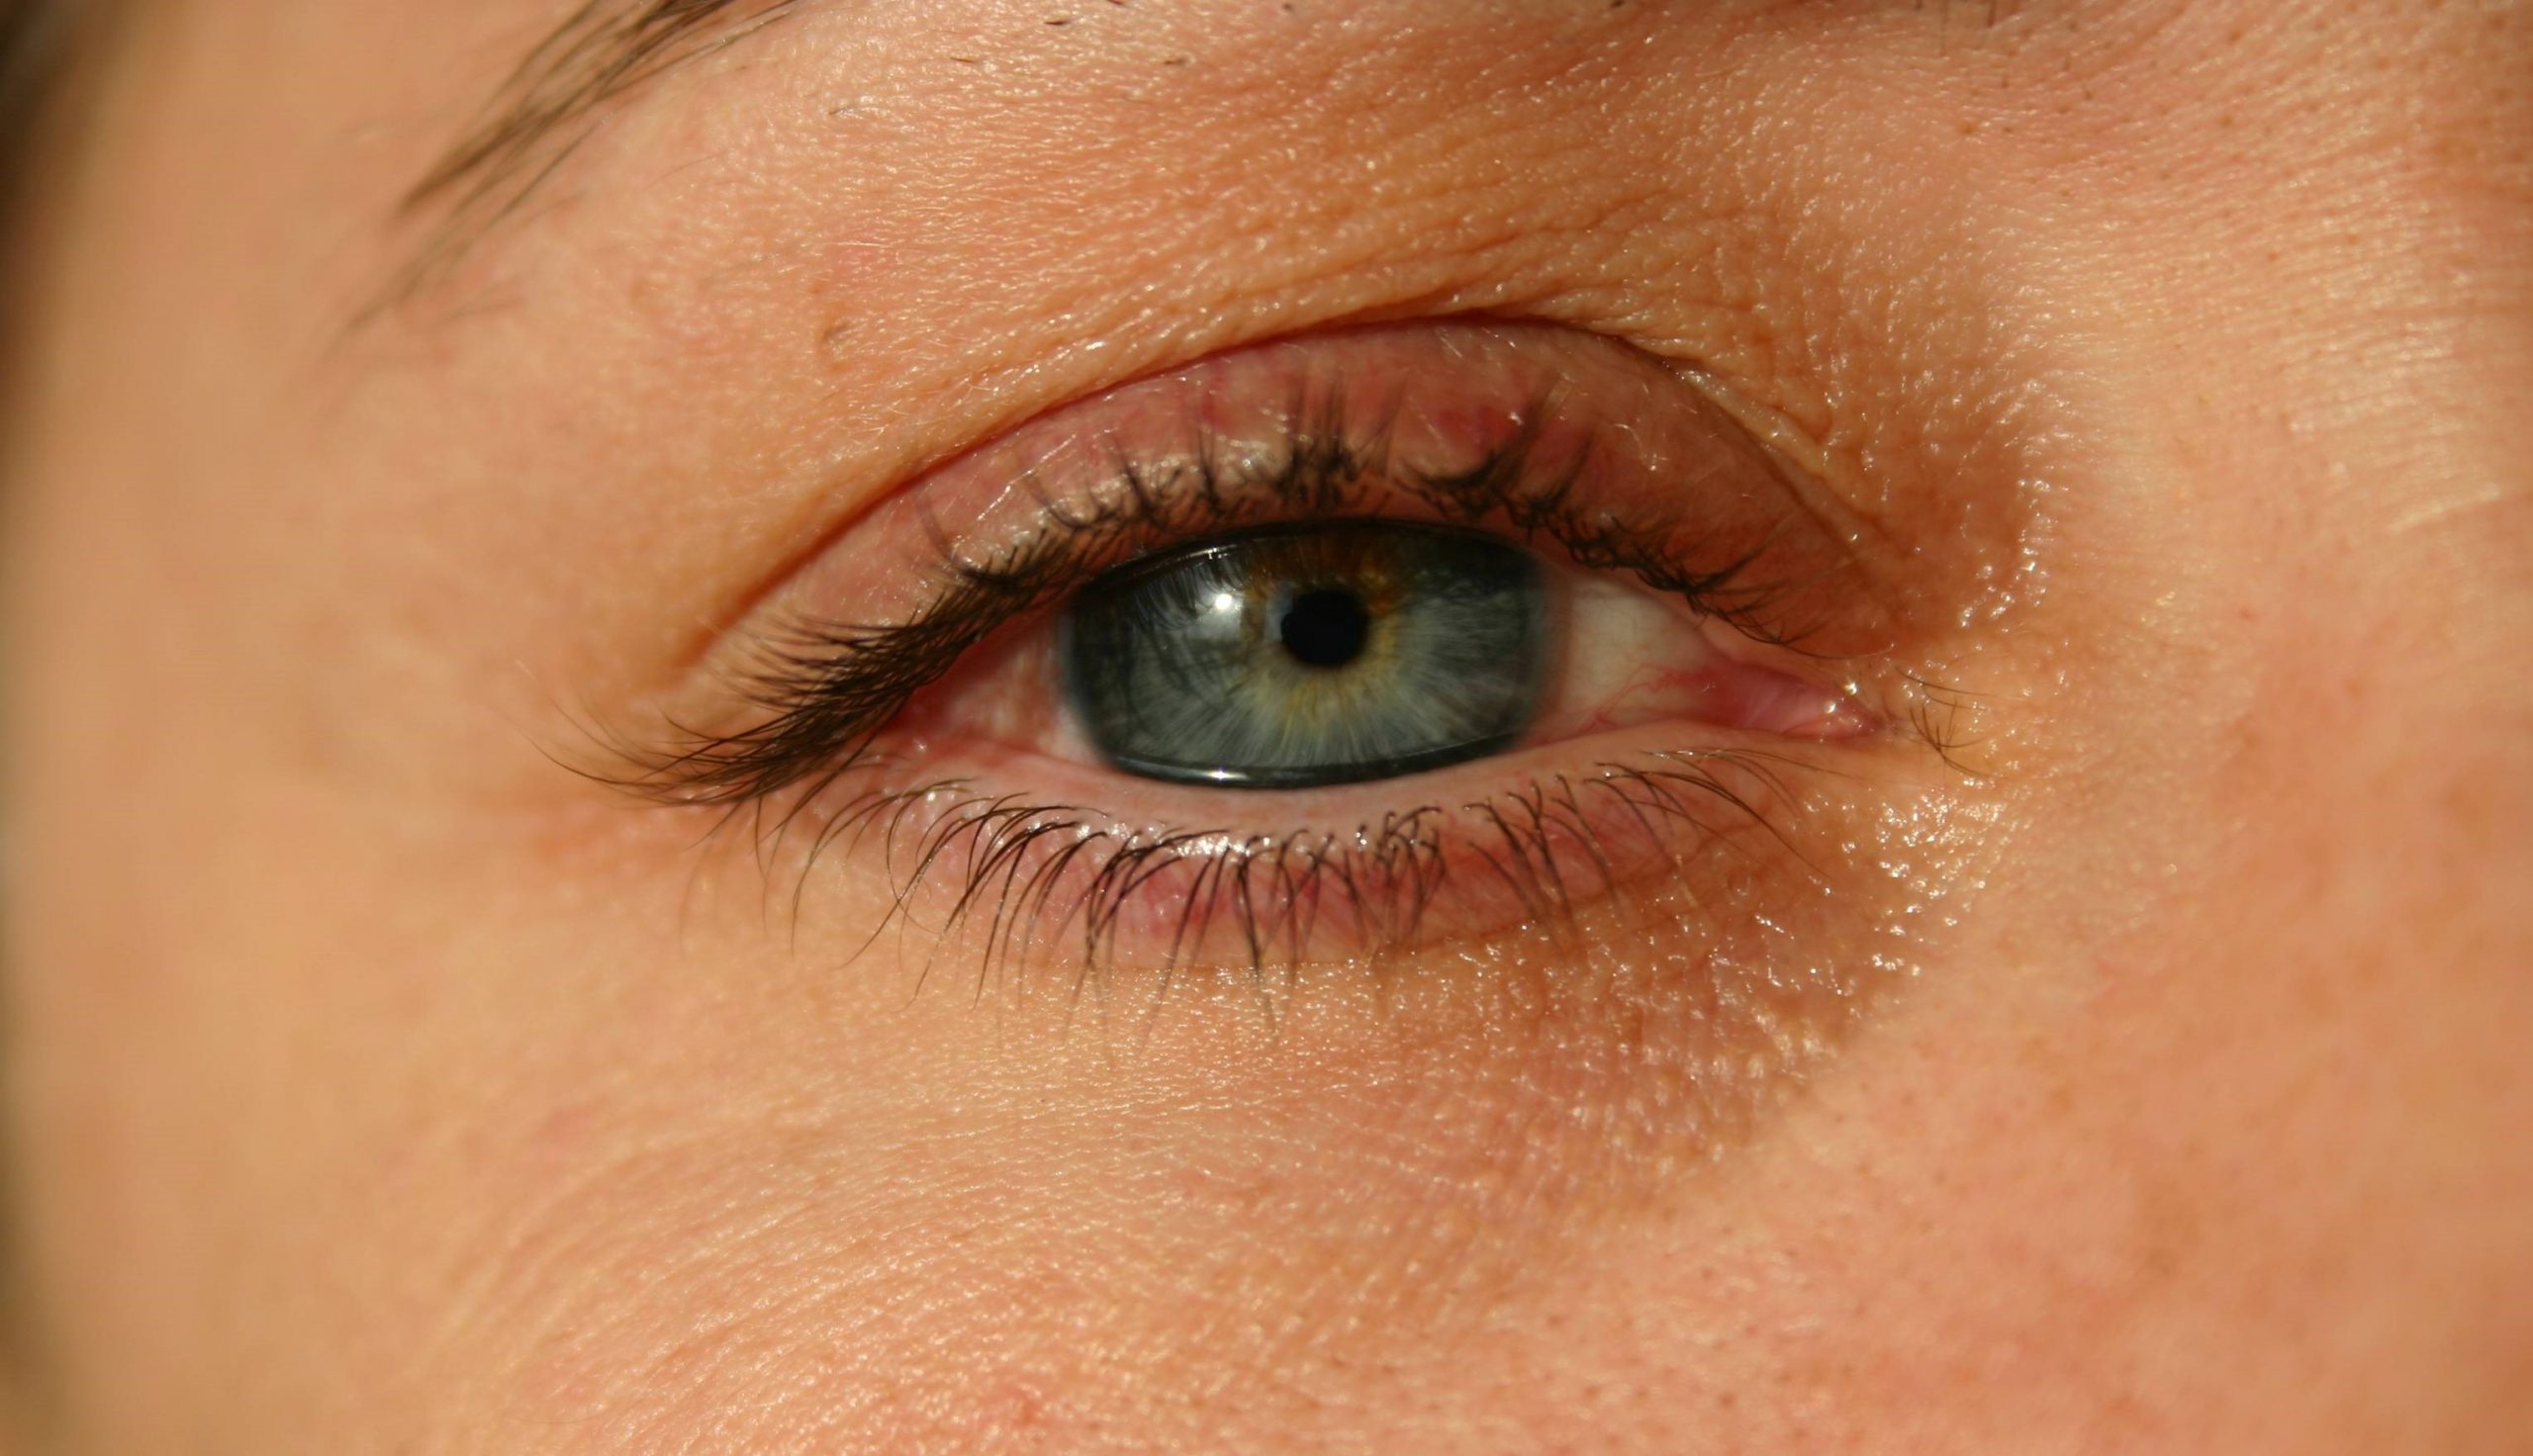 Conjunctivitis symptoms